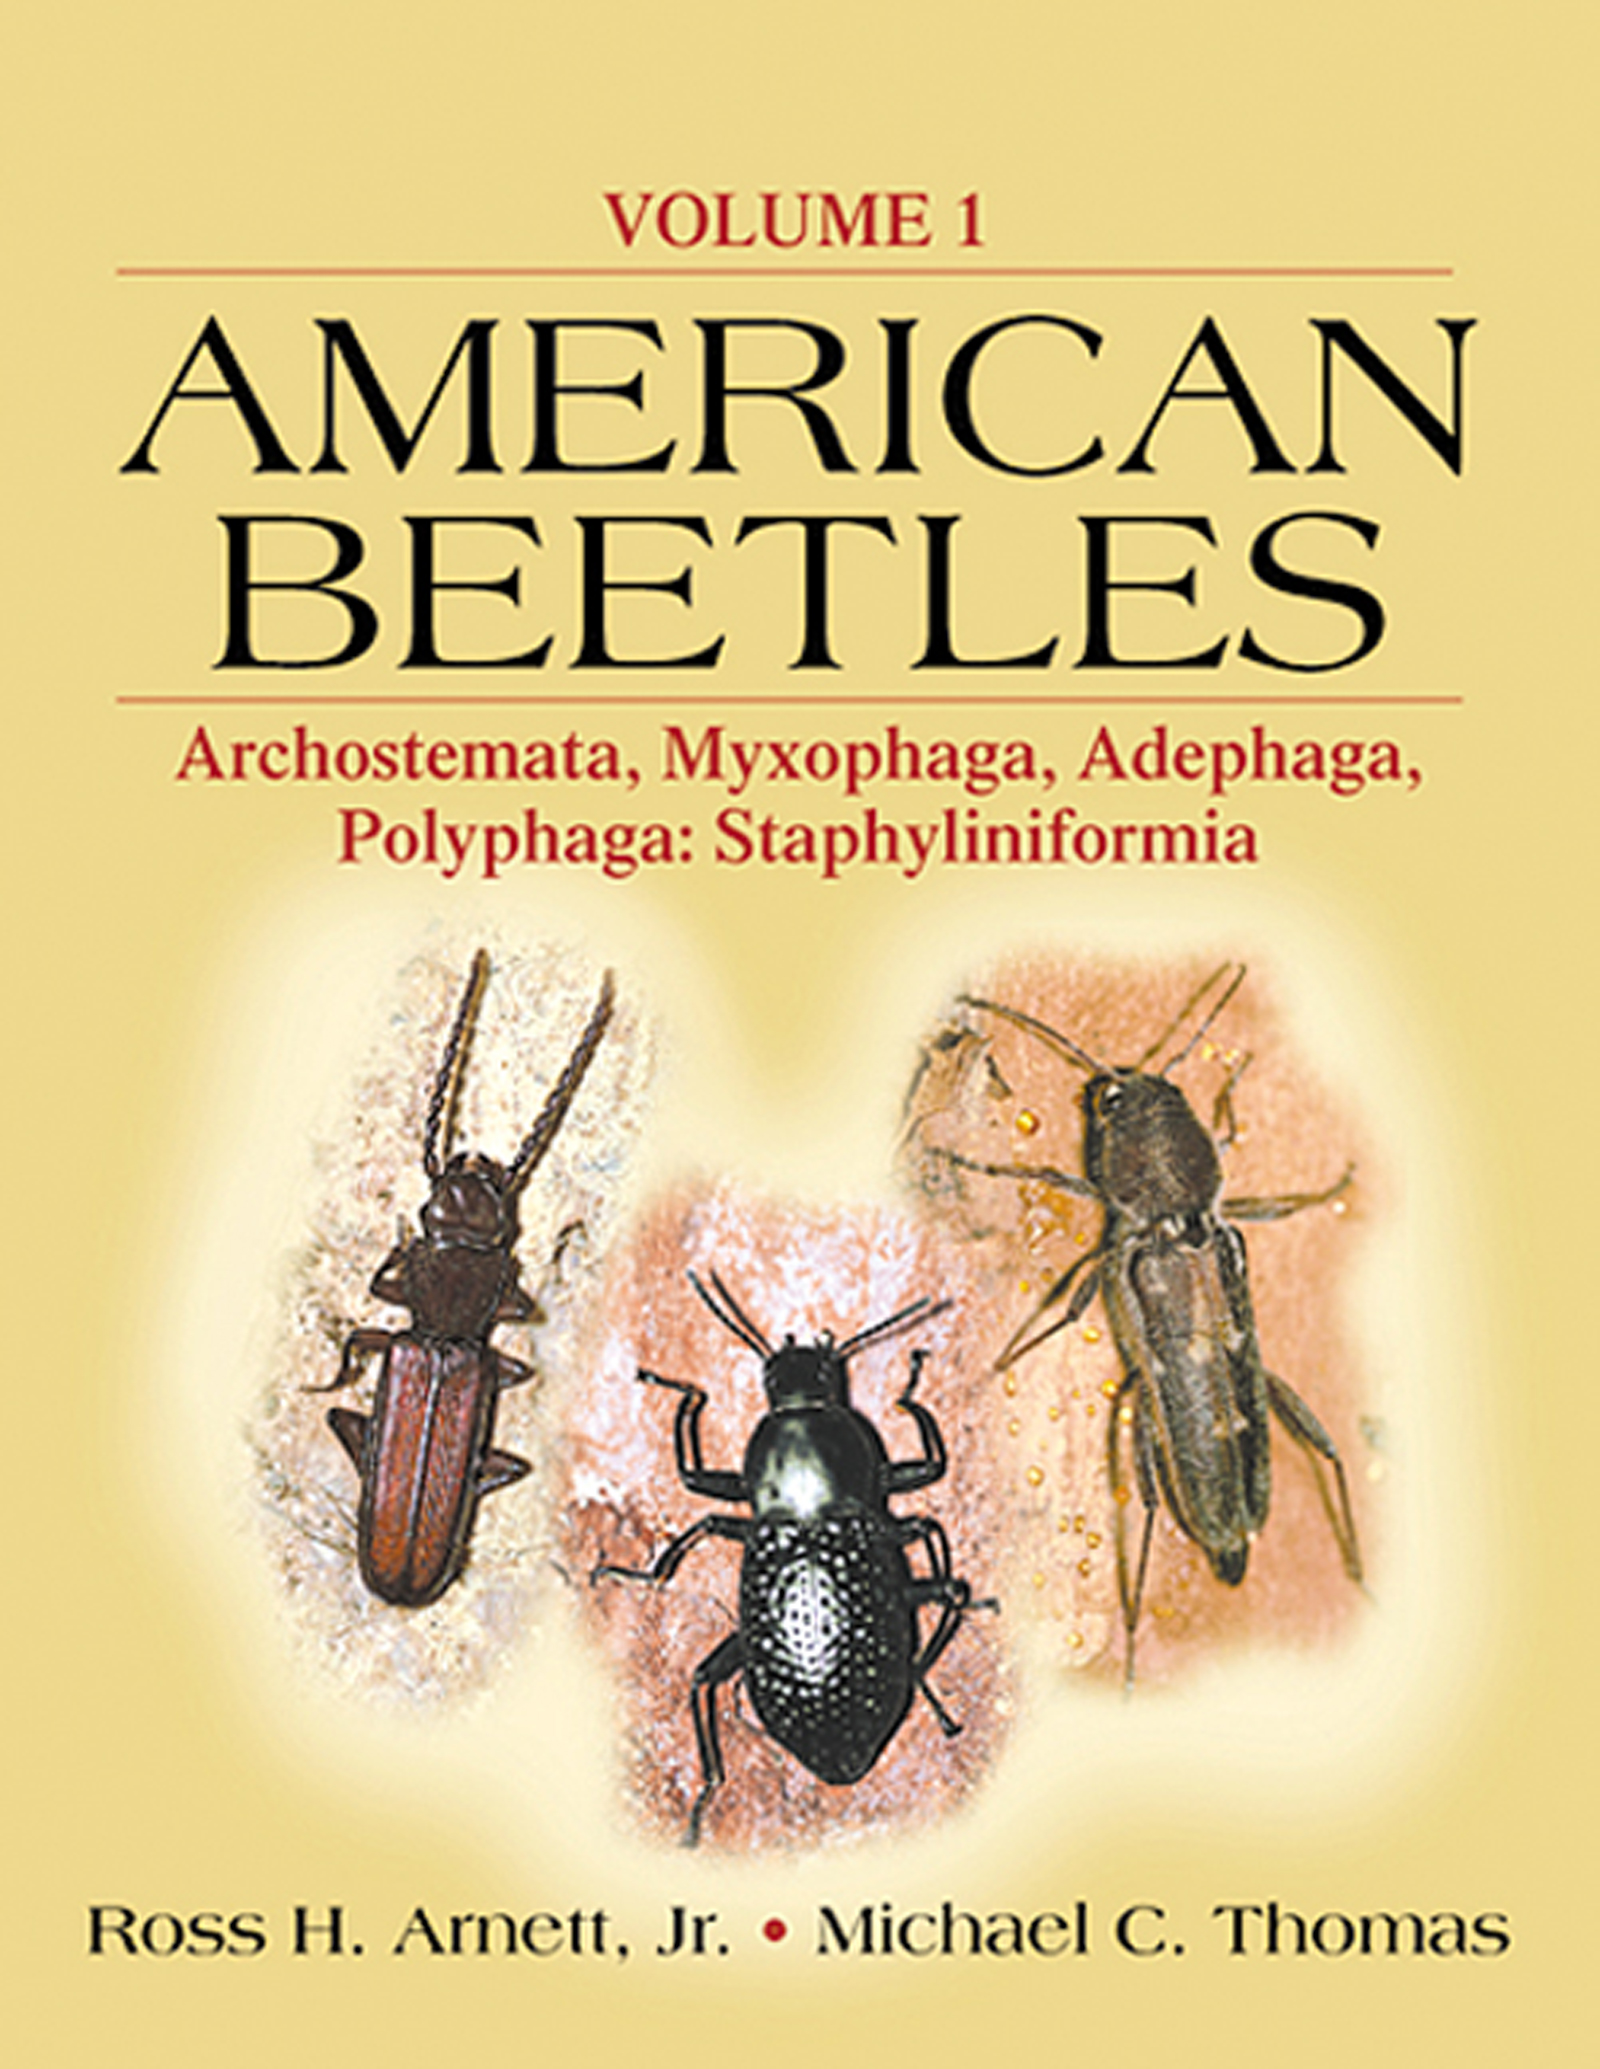 American Beetles, Volume I: Archostemata, Myxophaga, Adephaga